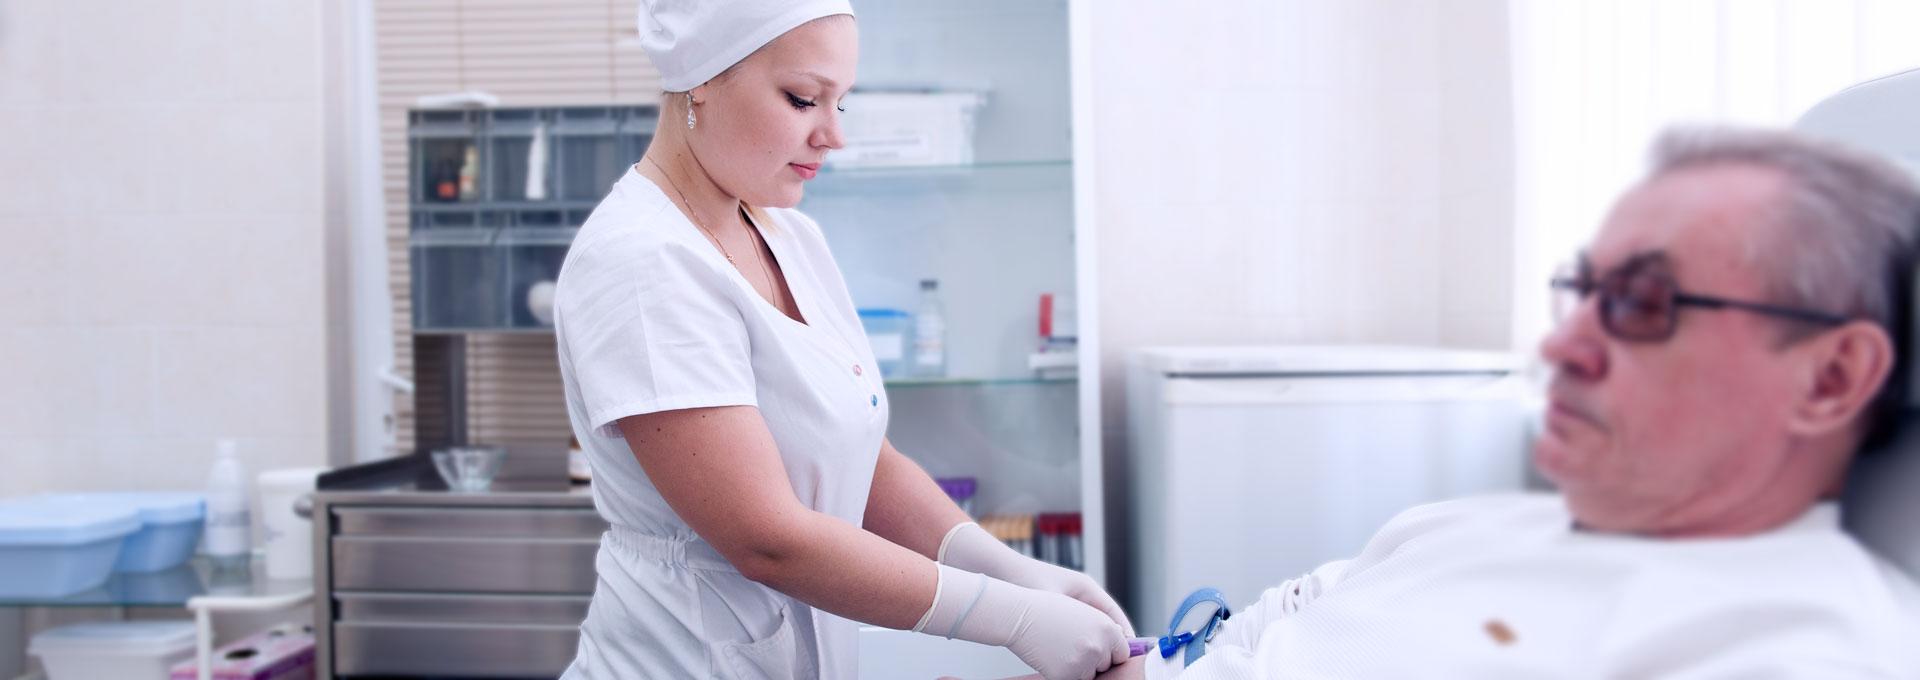 clinica_urologii_sechenova_analizy